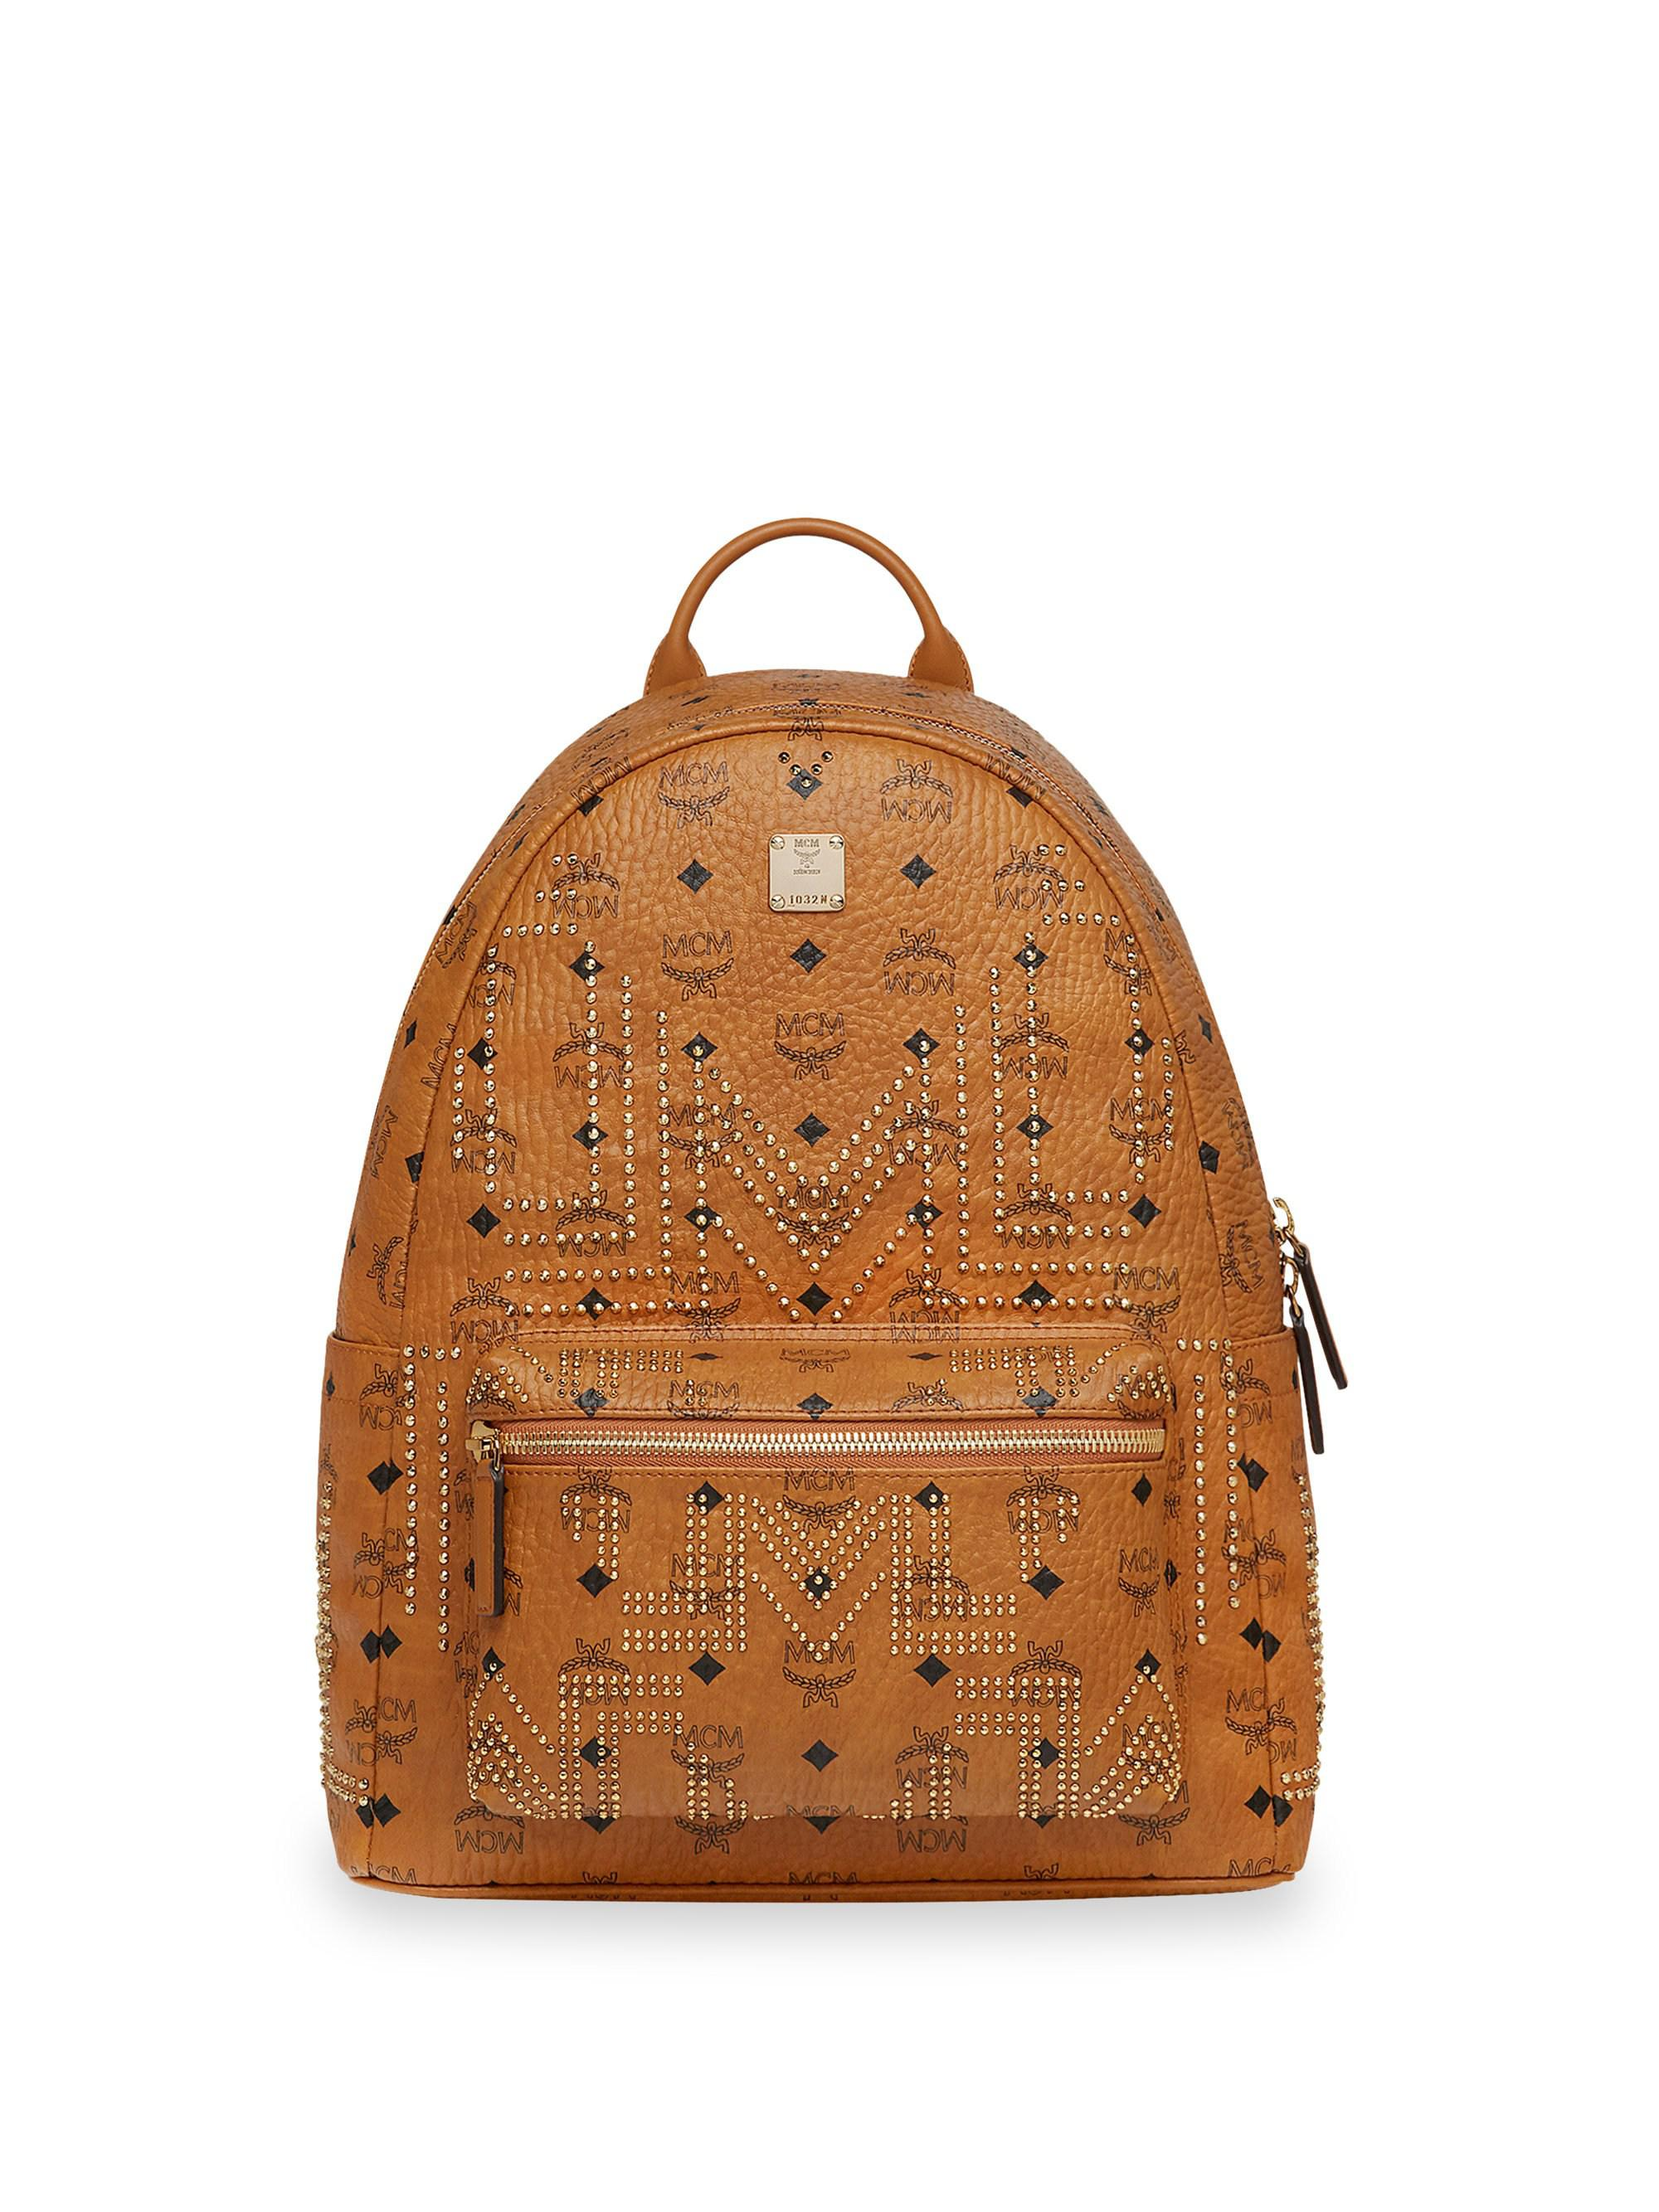 47c826d8fb3 MCM - Brown Medium Stark Gunta Studded Backpack for Men - Lyst. View  fullscreen